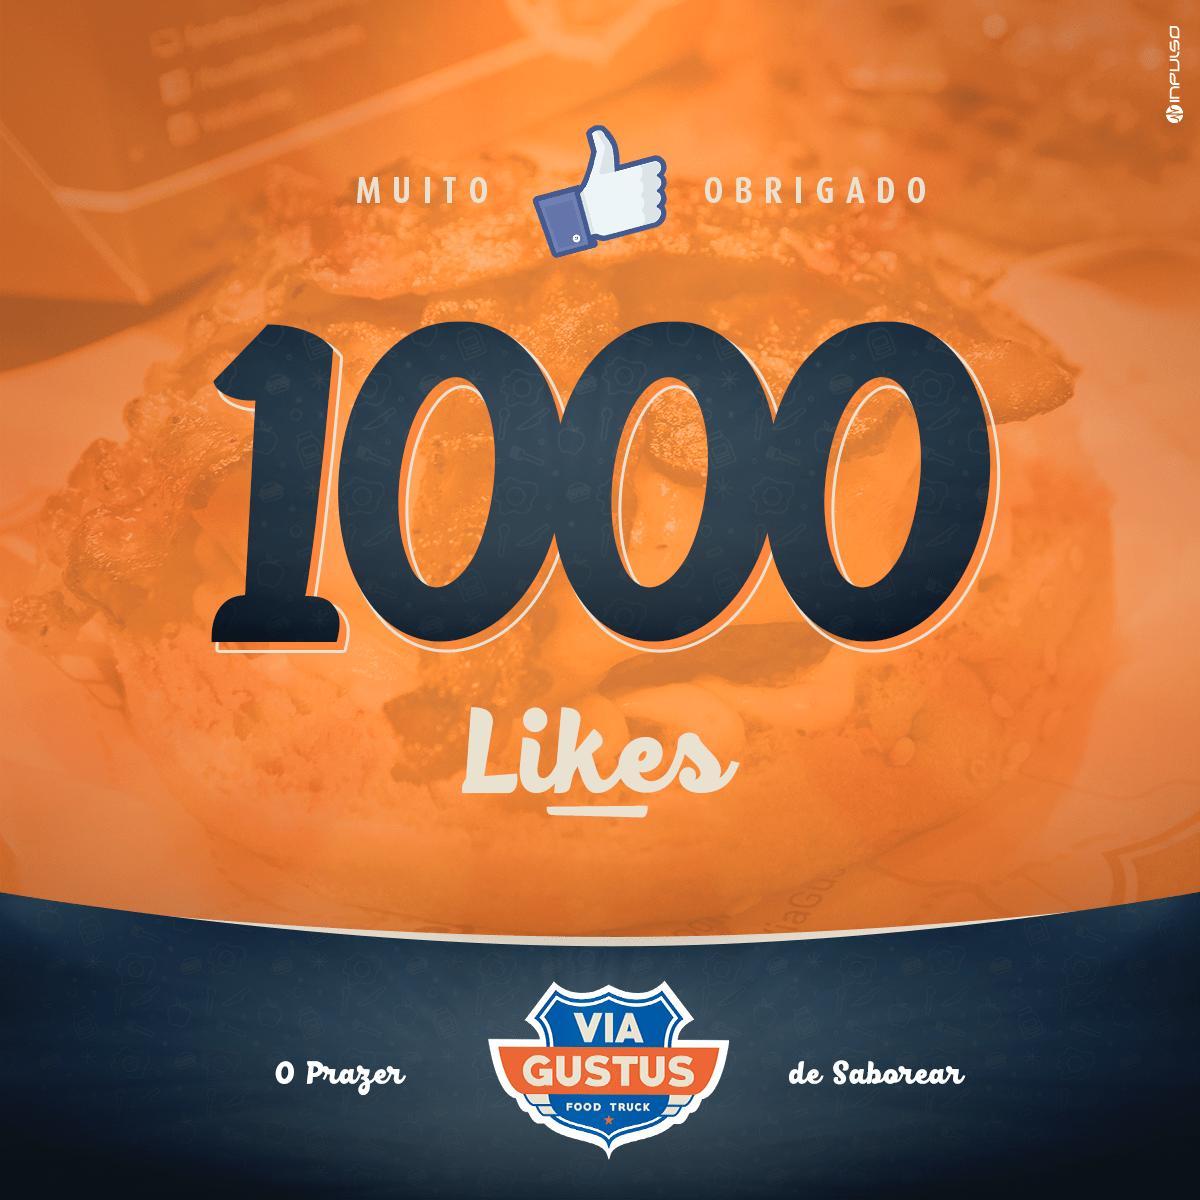 facebook 1000 likes food truck via gustus